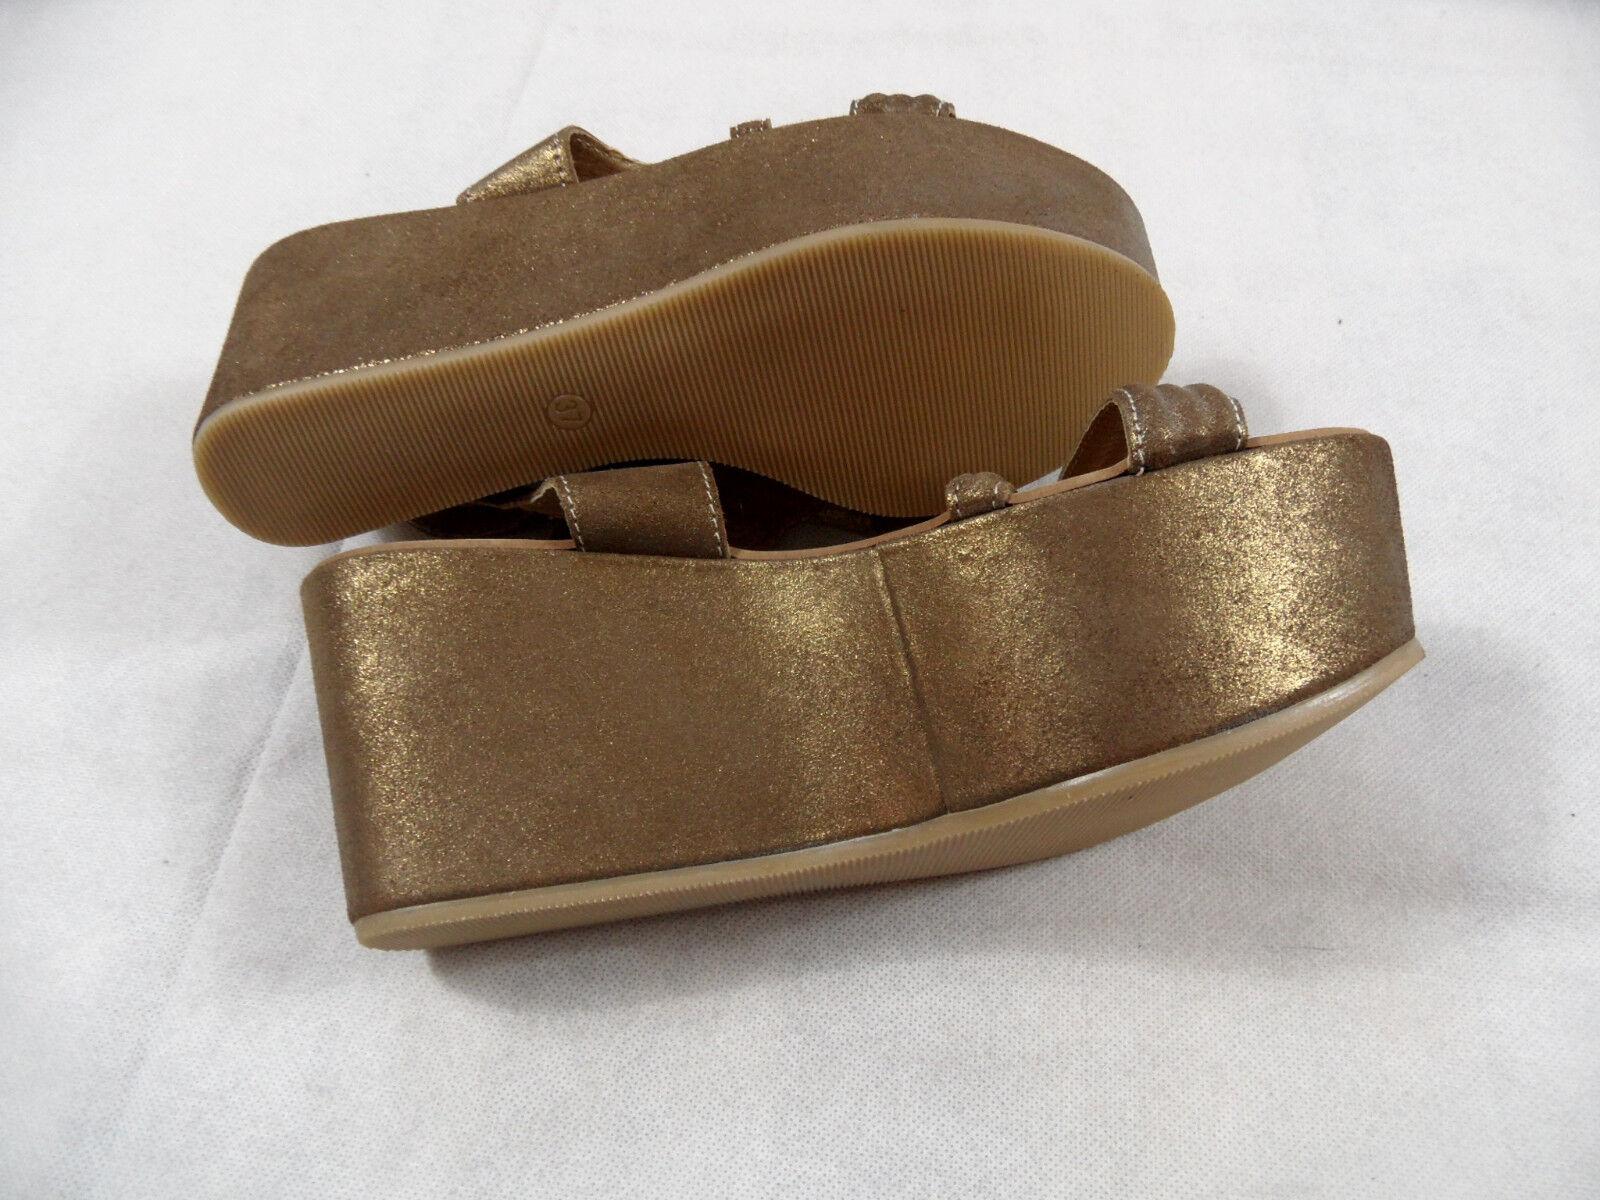 FABBRICA MORICHETTI stylische Plateau Sandalen gold Gr. 37 NEU BB718